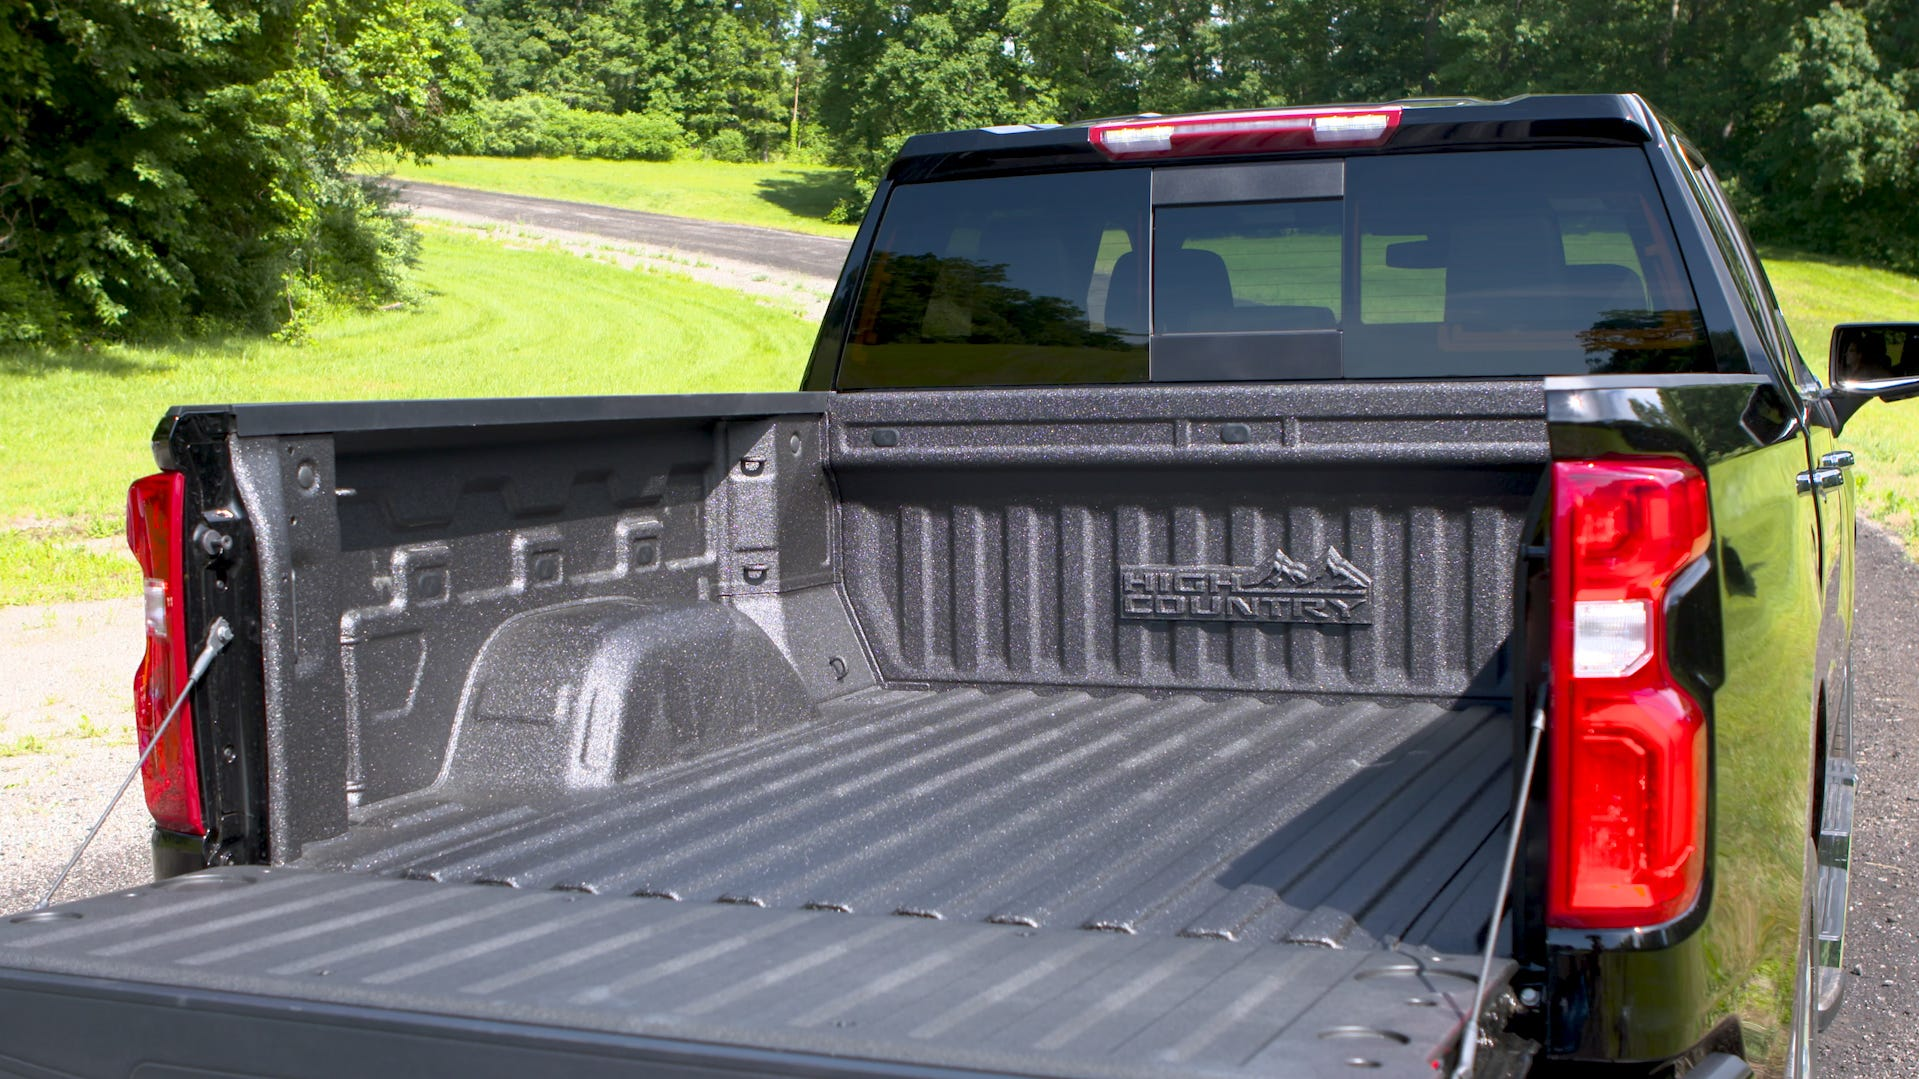 Chevrolet Silverado, GMC Sierra, Ram pickups sport secret storage spaces